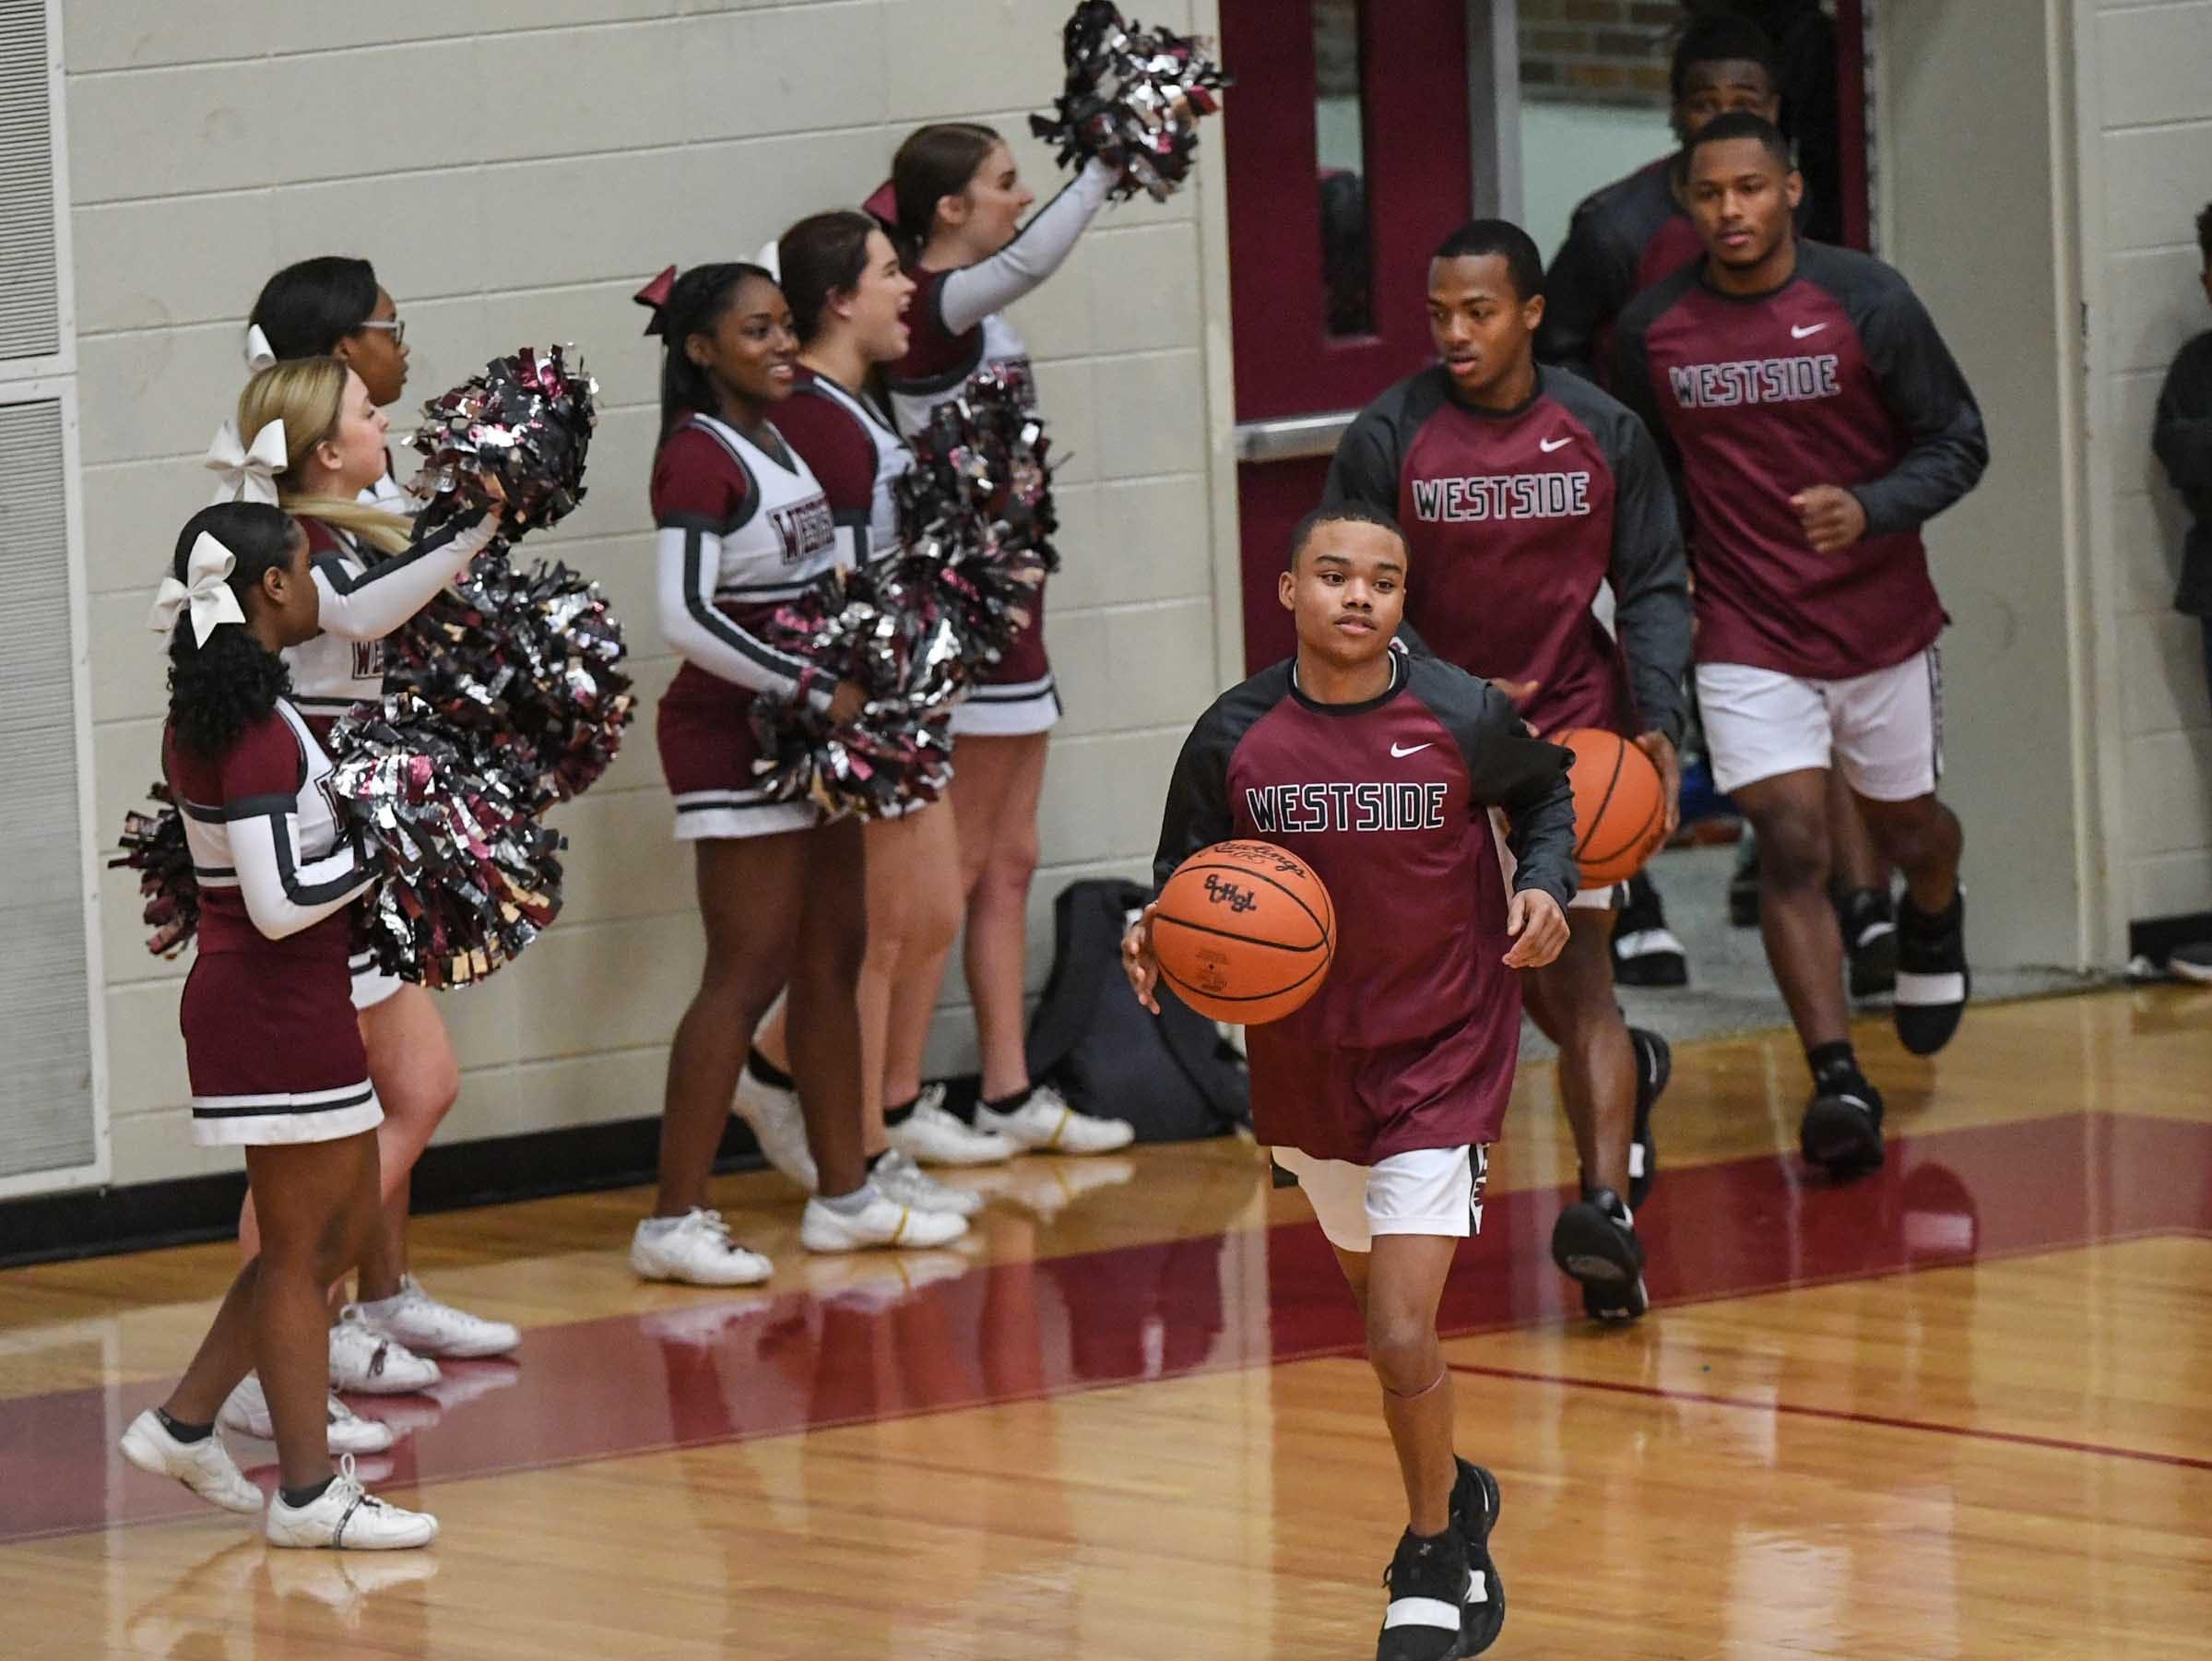 Westside senior Odarius Cade(2) leads teammates on the floor before the game with Easley High School at Westside High School Friday, December 14, 2018.